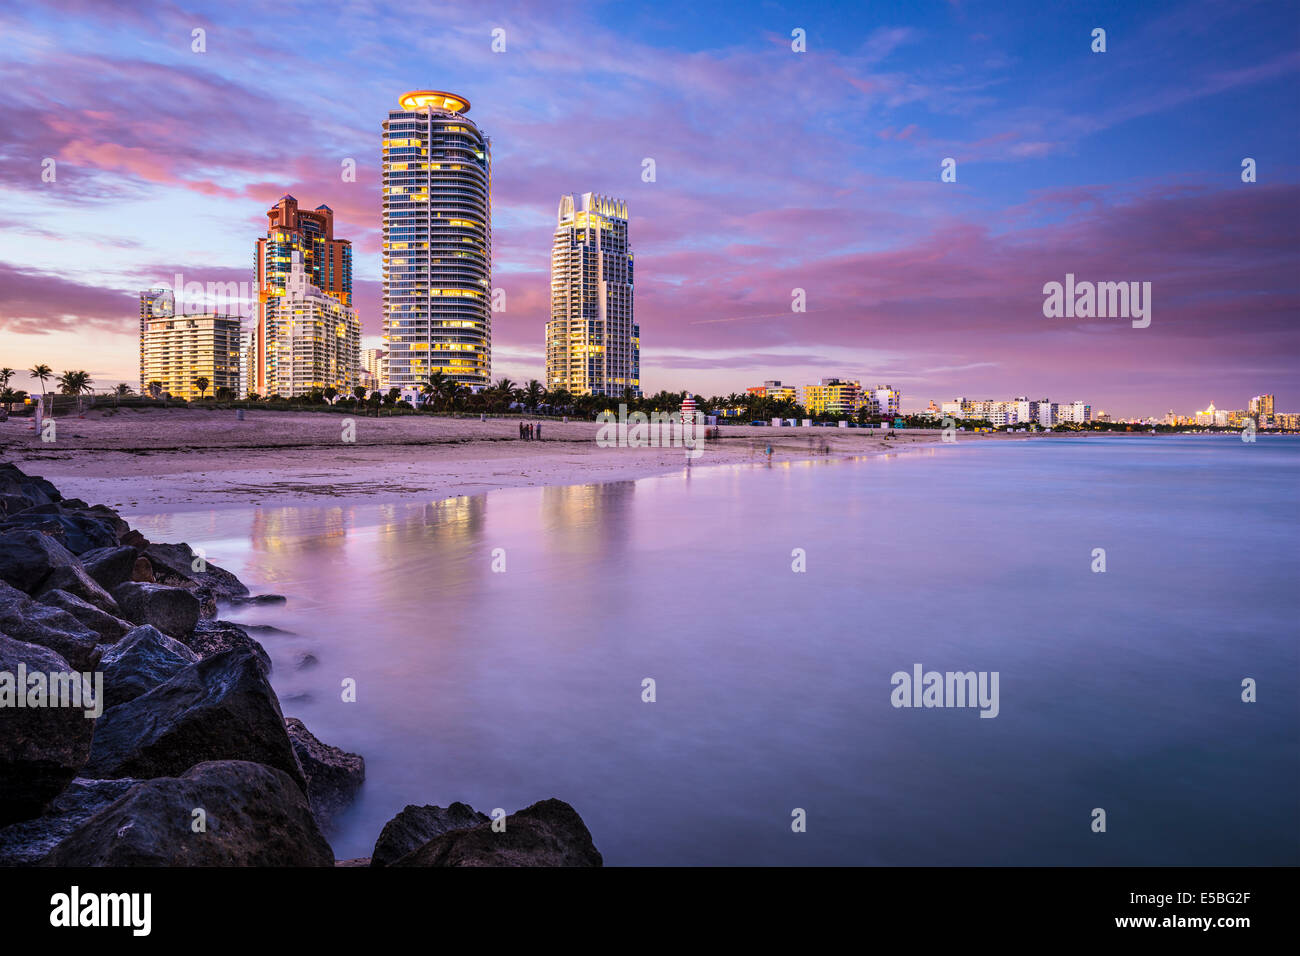 Miami, Florida, USA am Südstrand. Stockbild